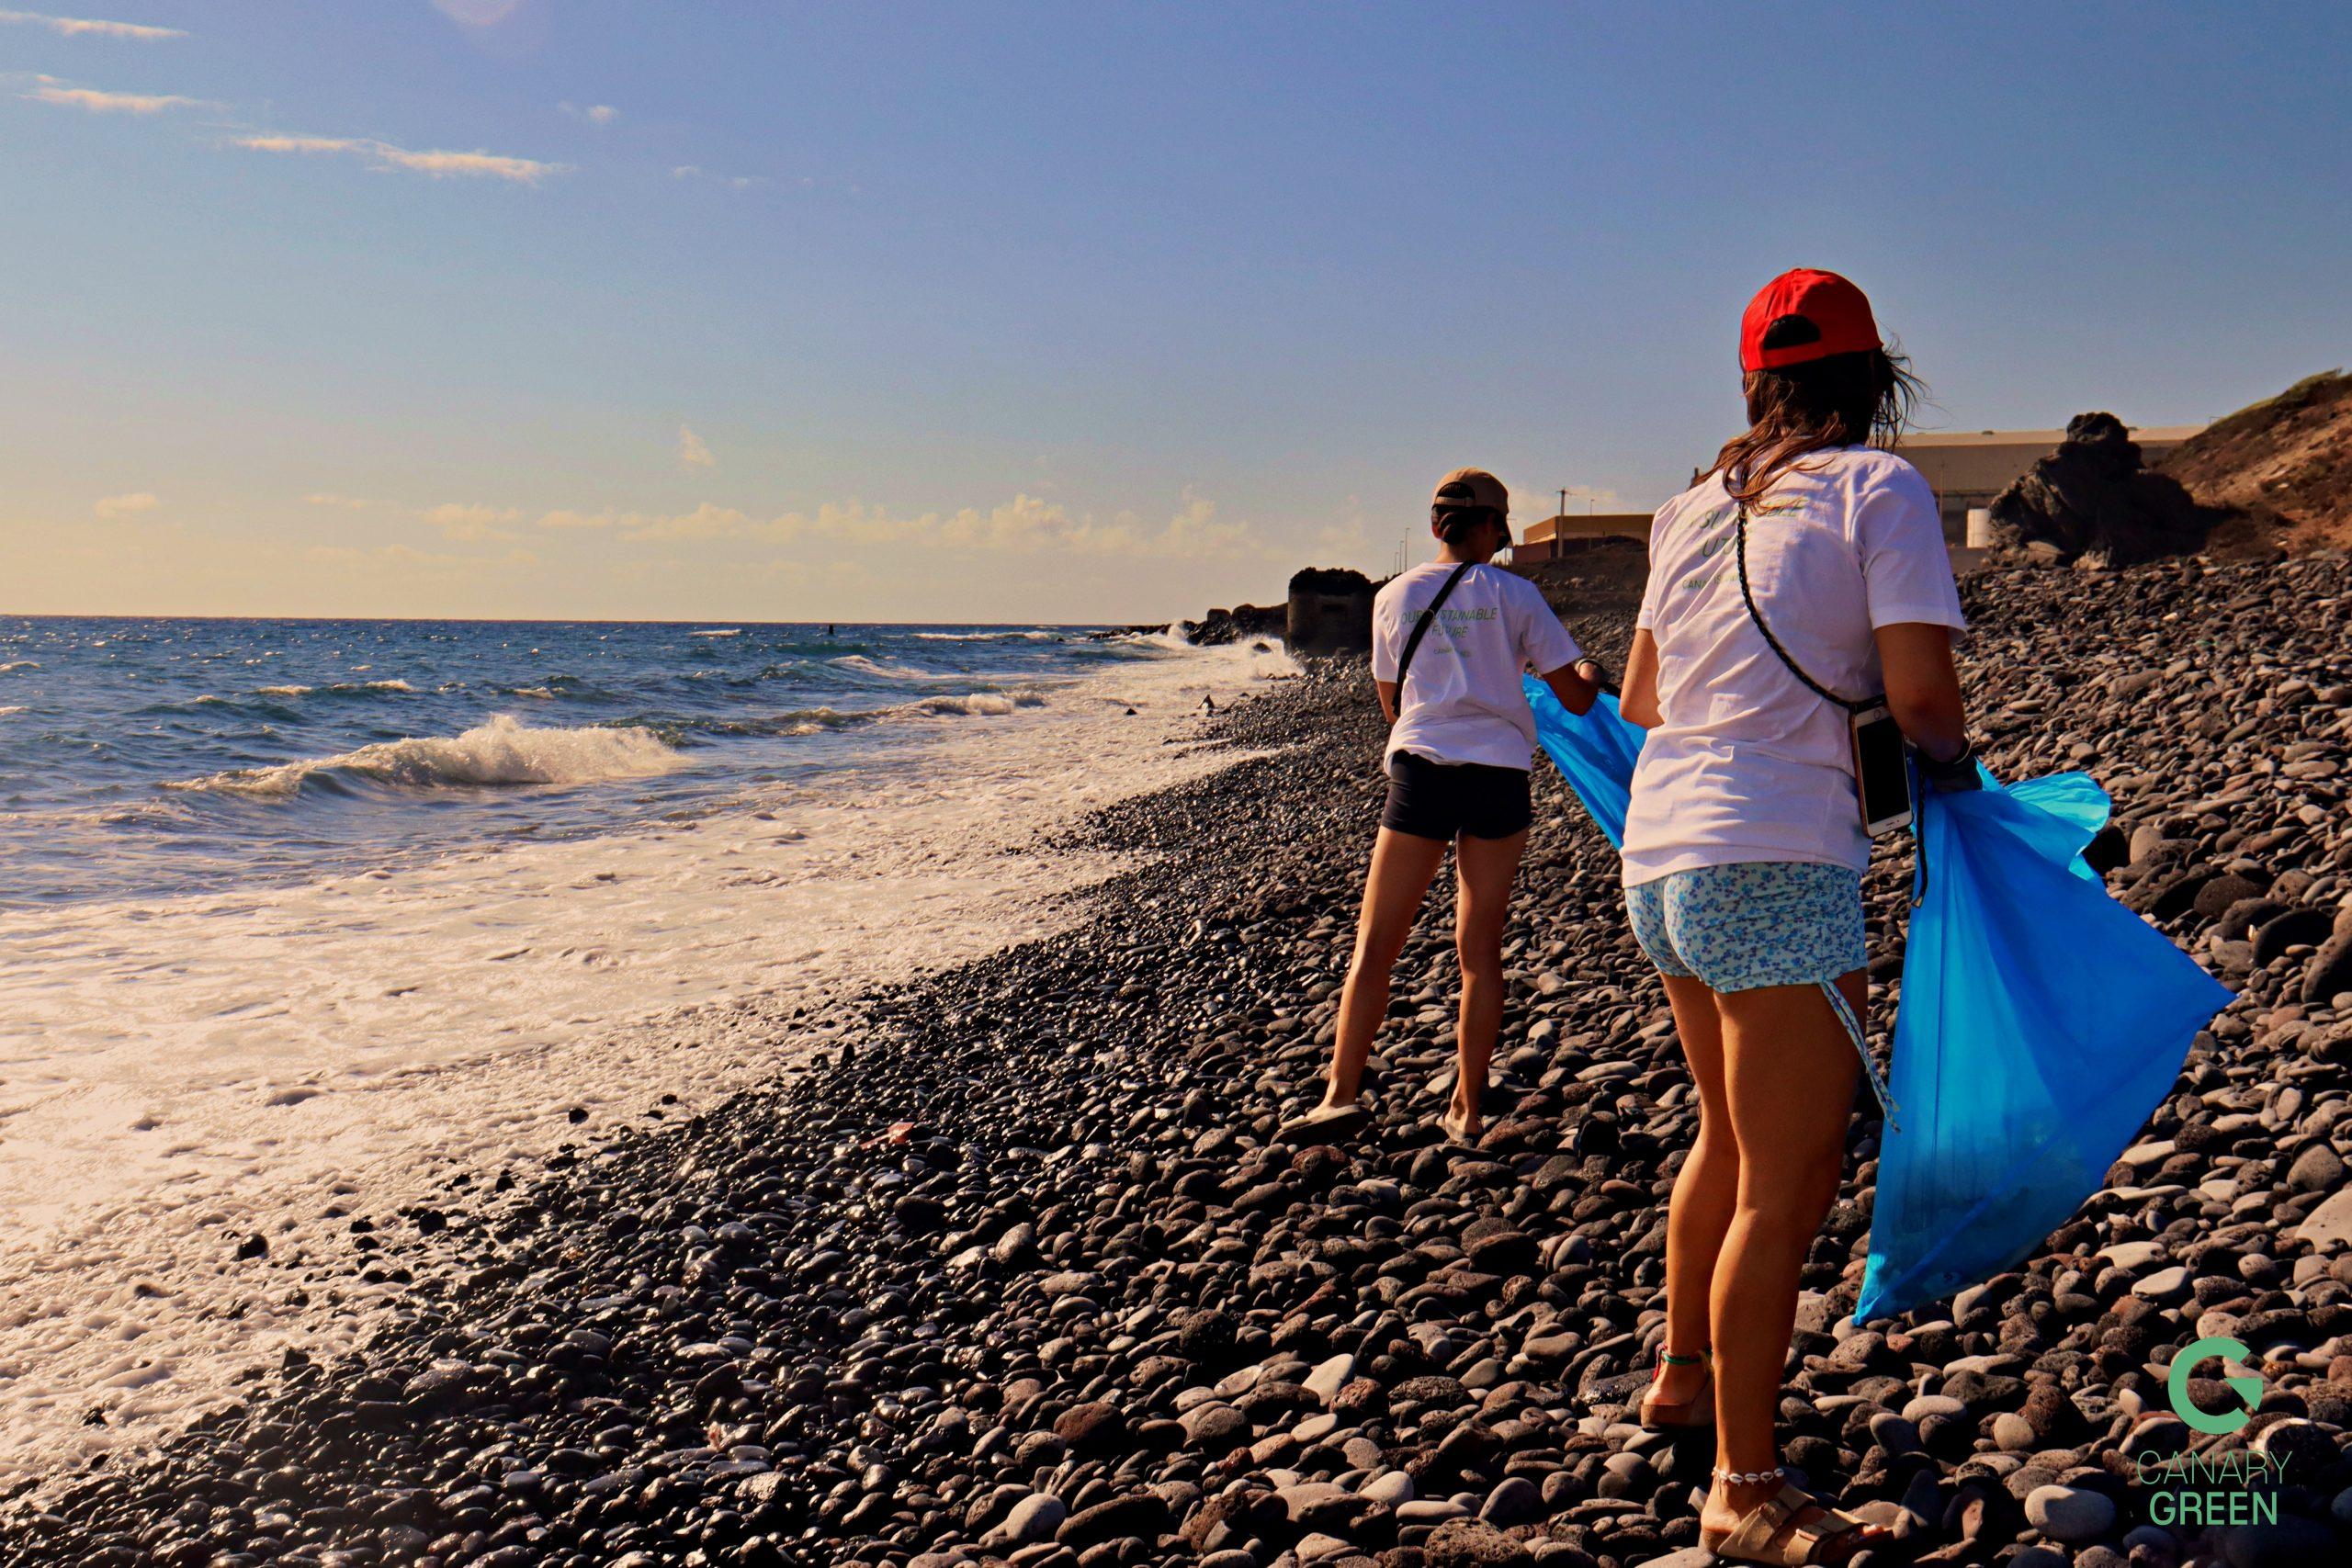 Beach Clean Up in Playa de Lima, Tenerife - Hanna Schumann & Lisa Plaickner